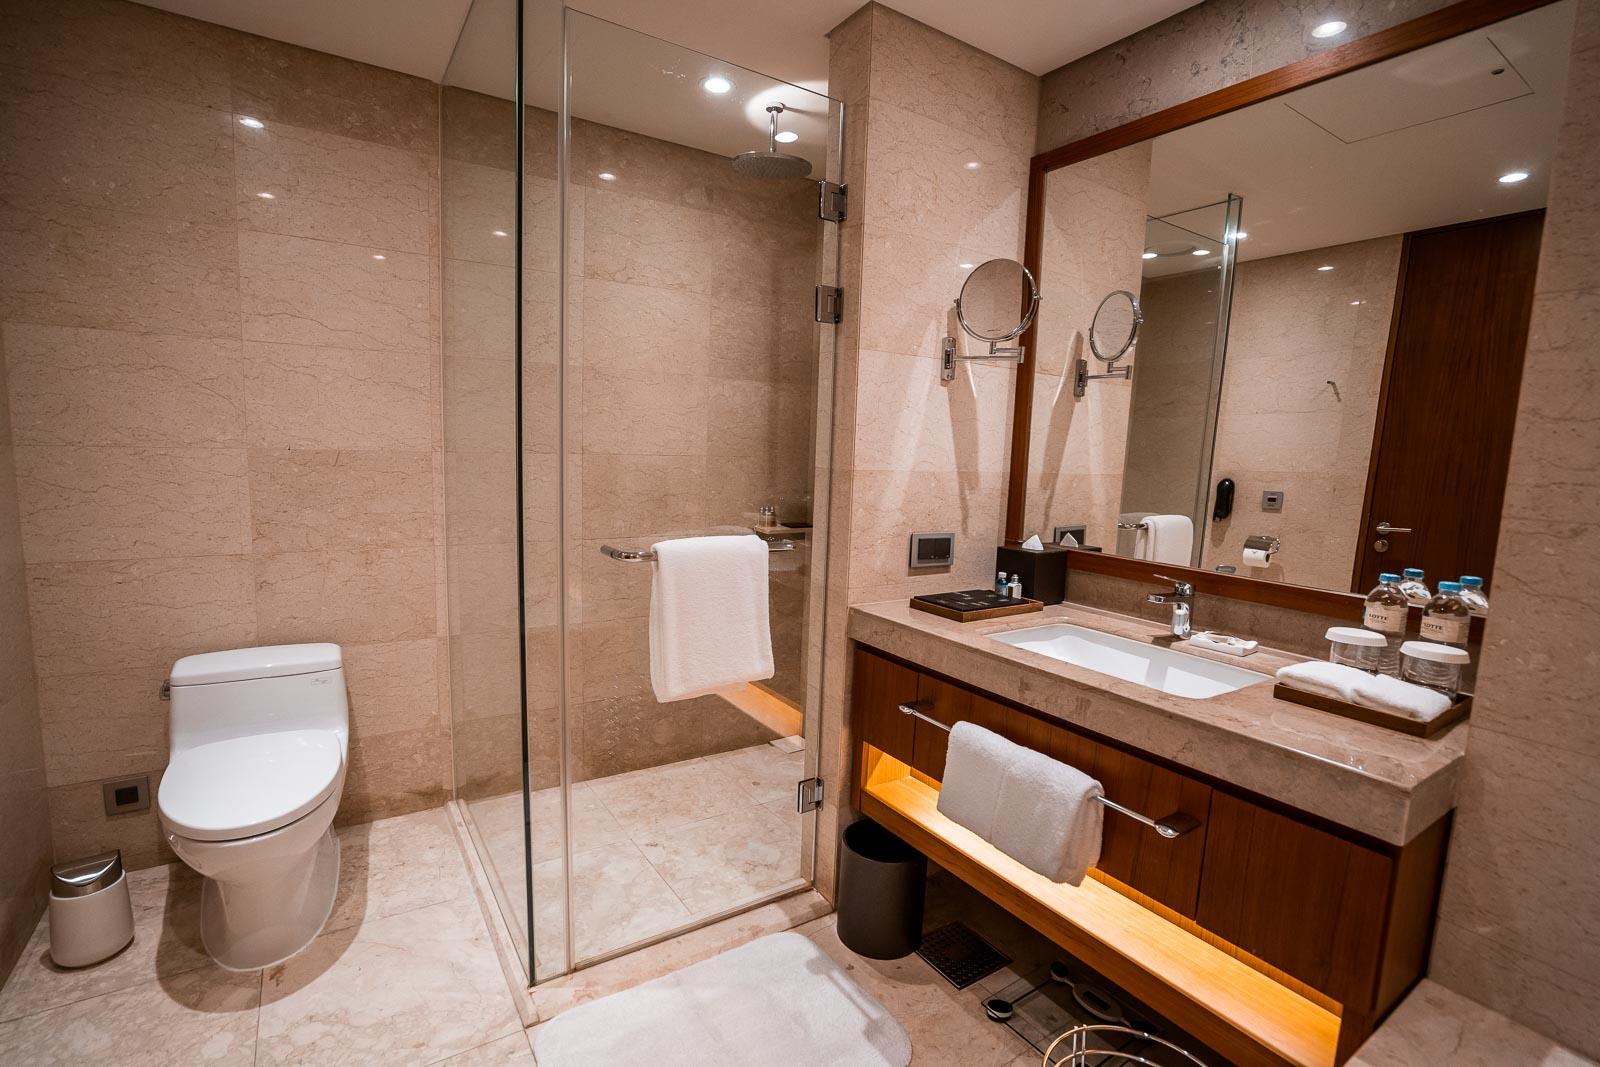 Bathroom at Lotte Hotel Yangon